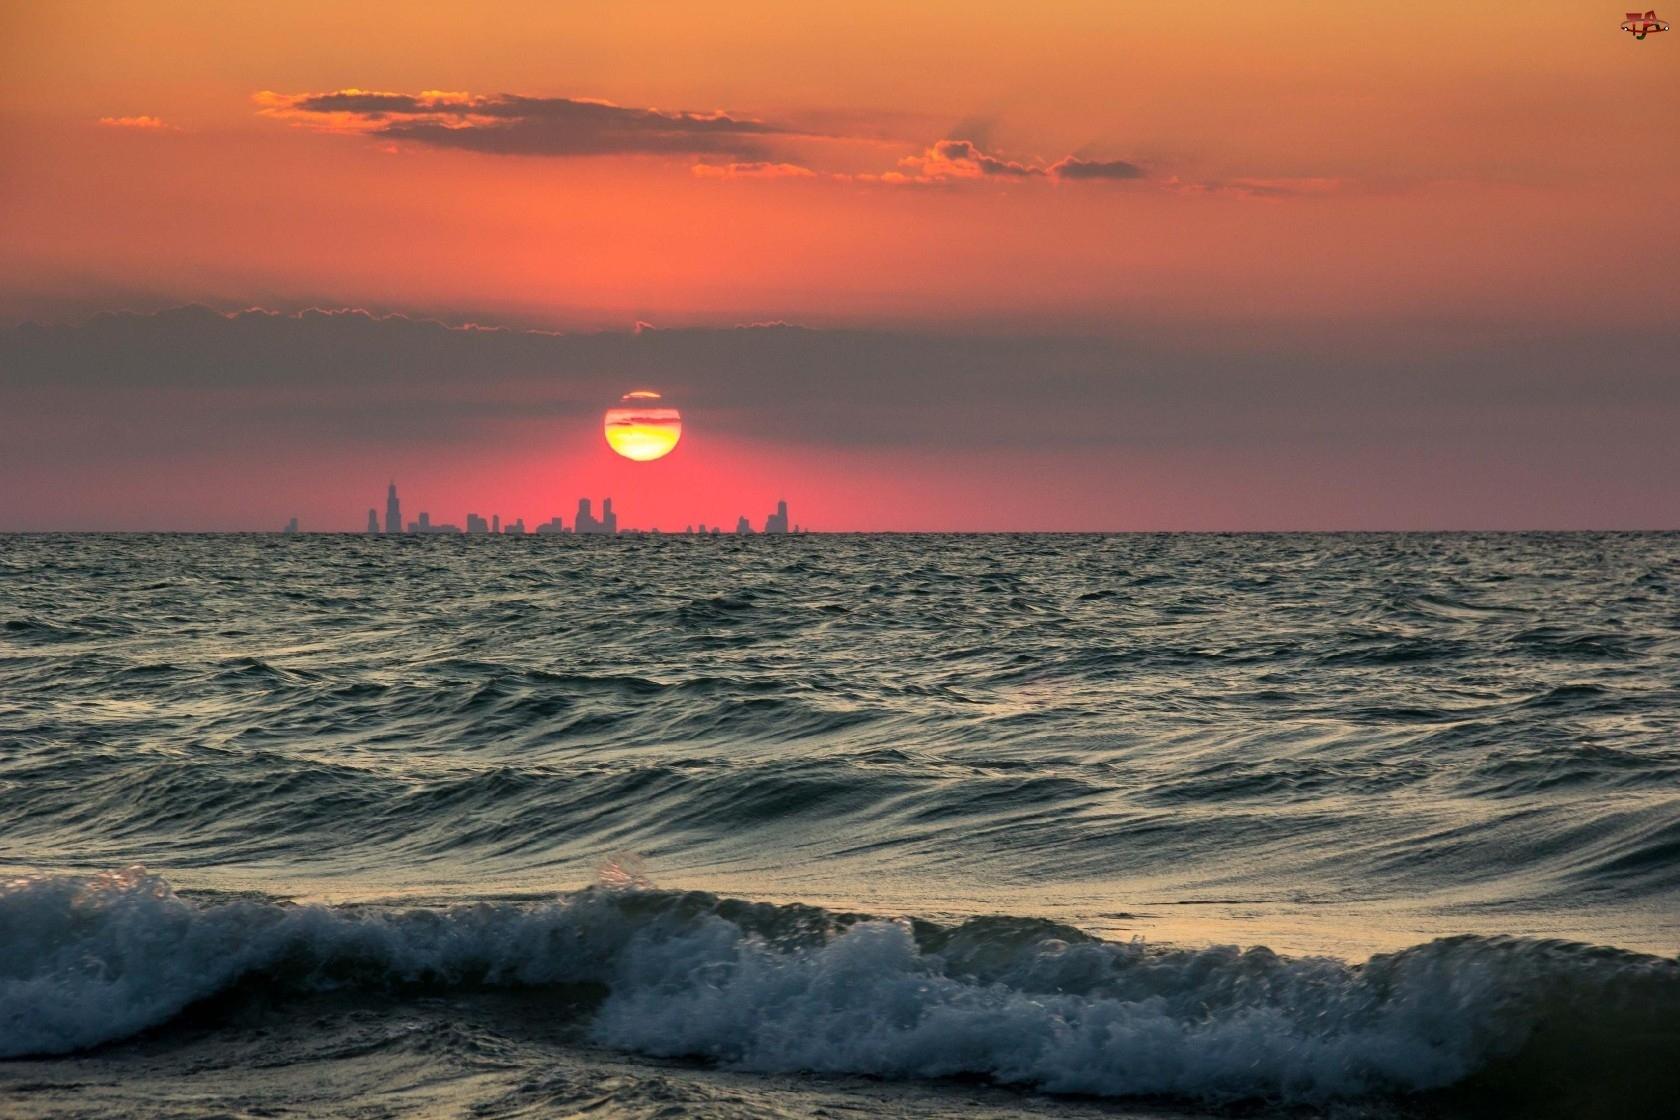 Morze, Zachód, Słońca